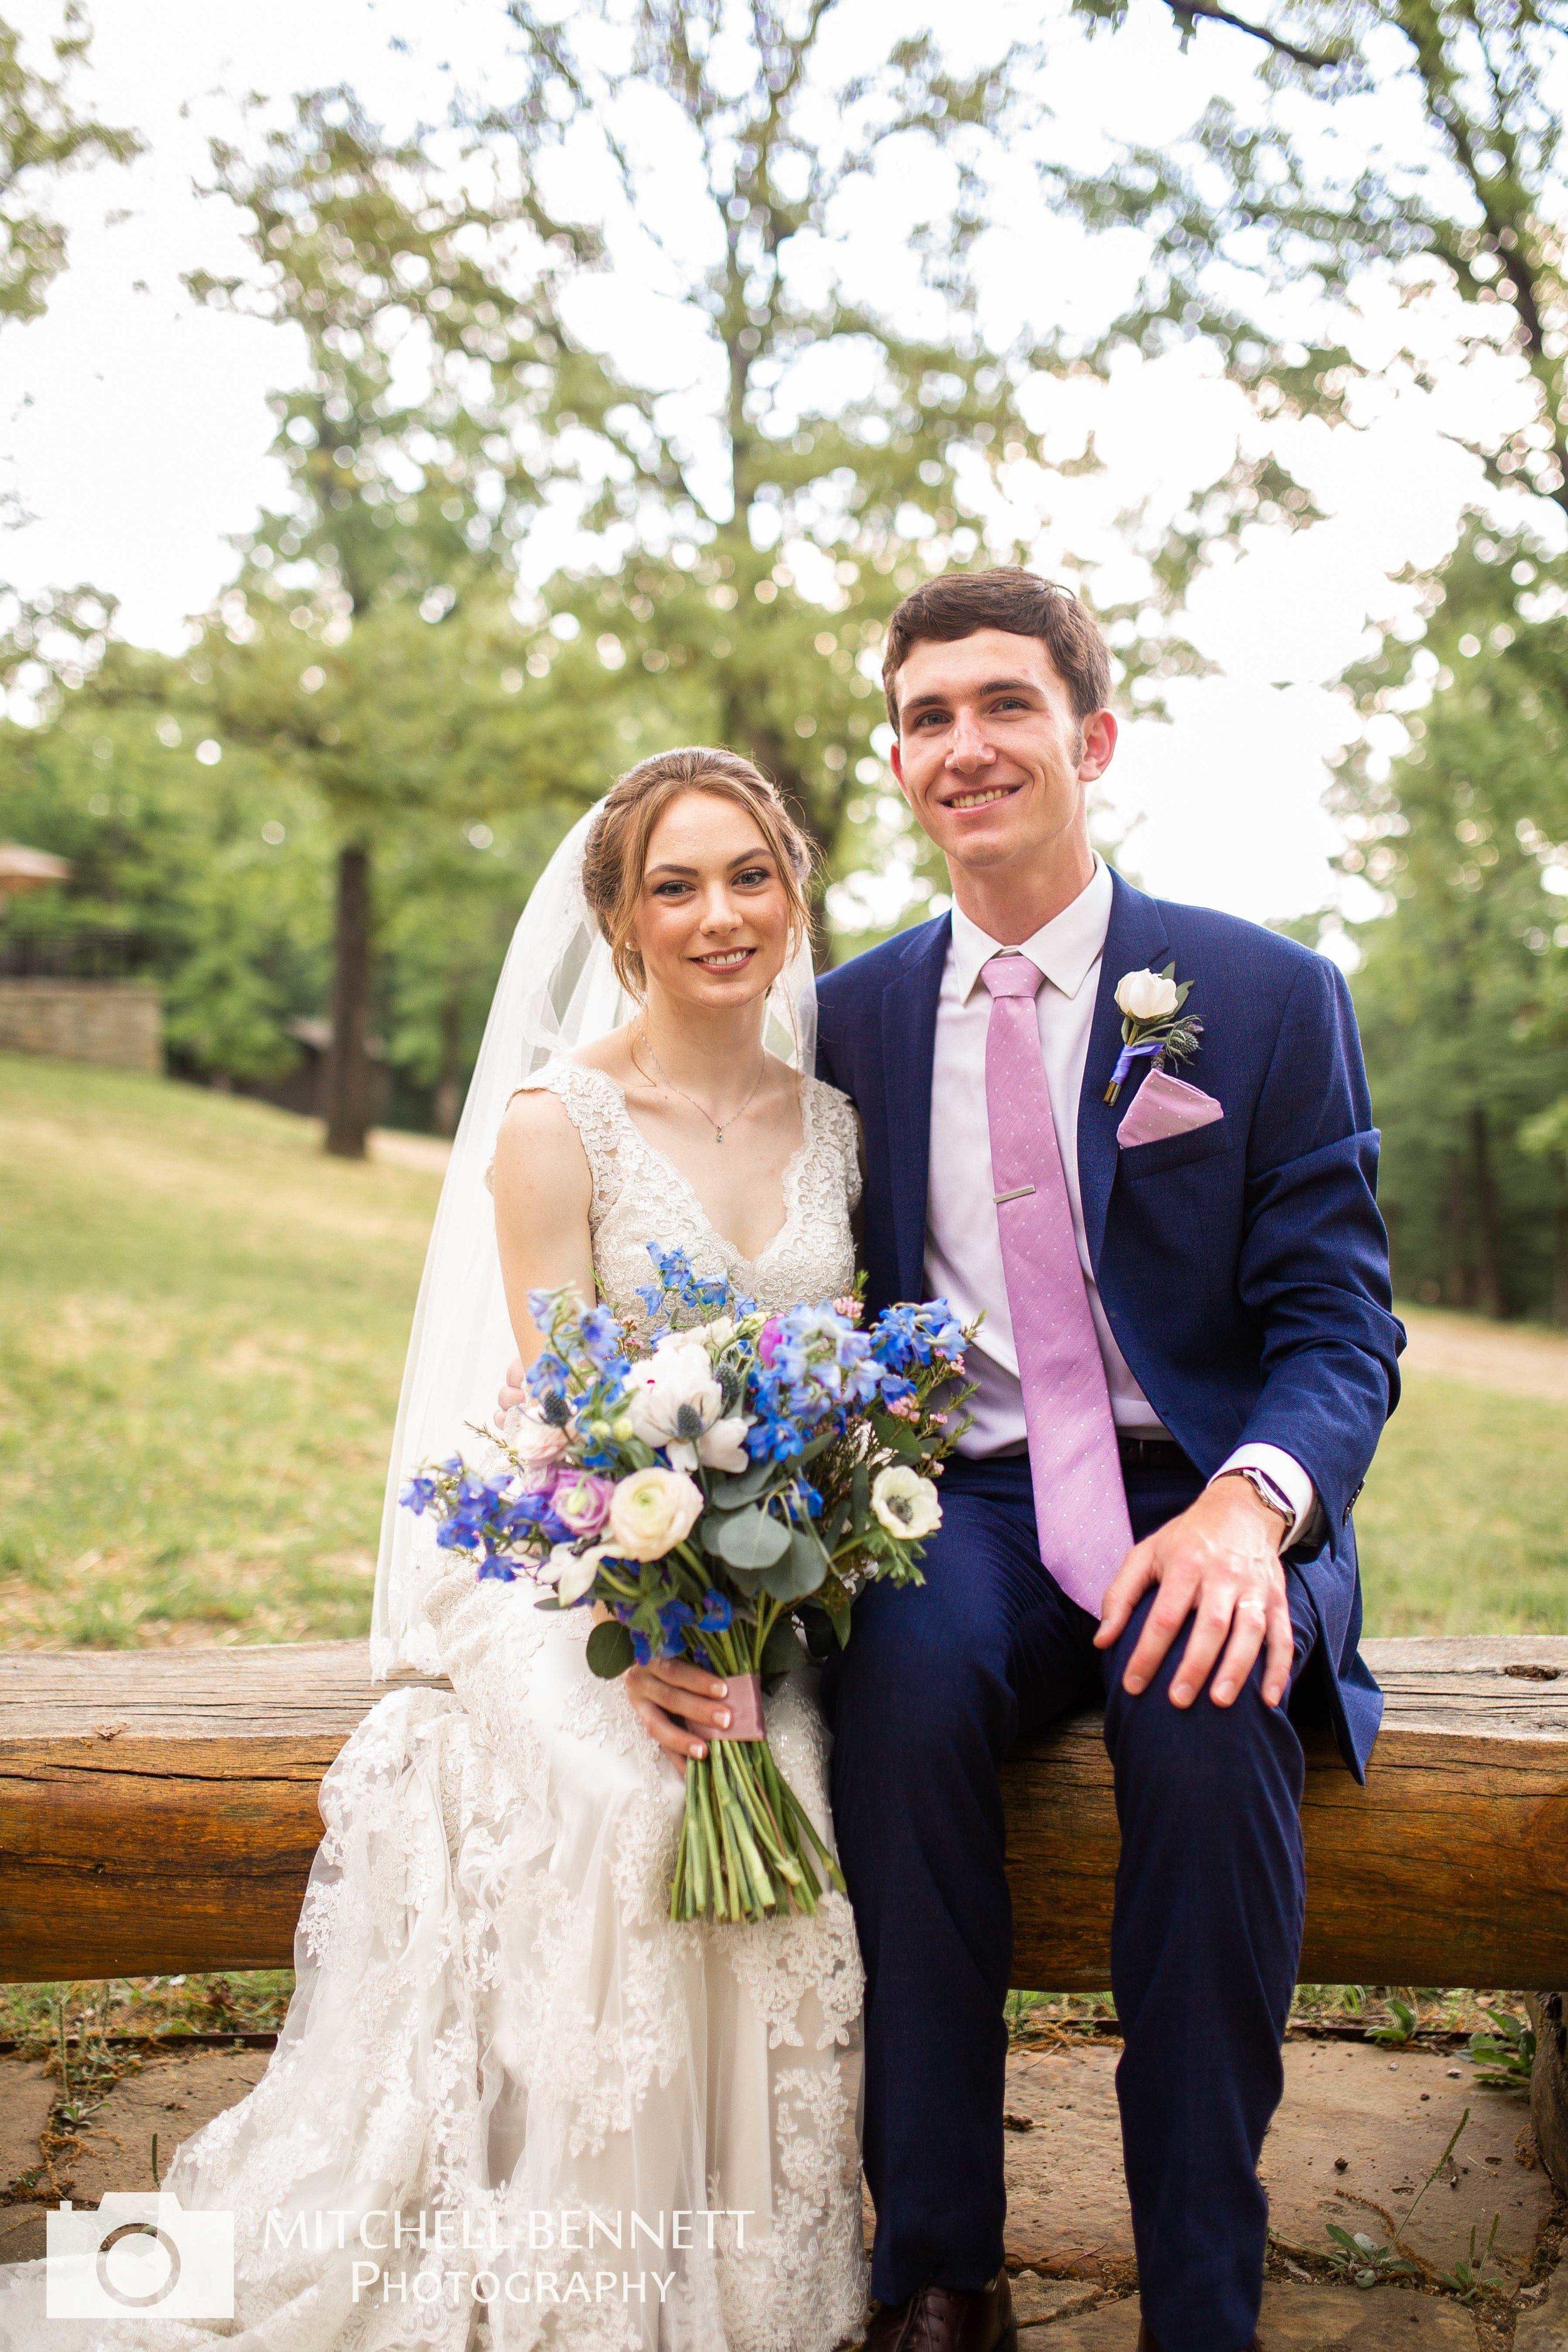 Pin Oak Lodge Wedding Venue Lake of the Ozarks